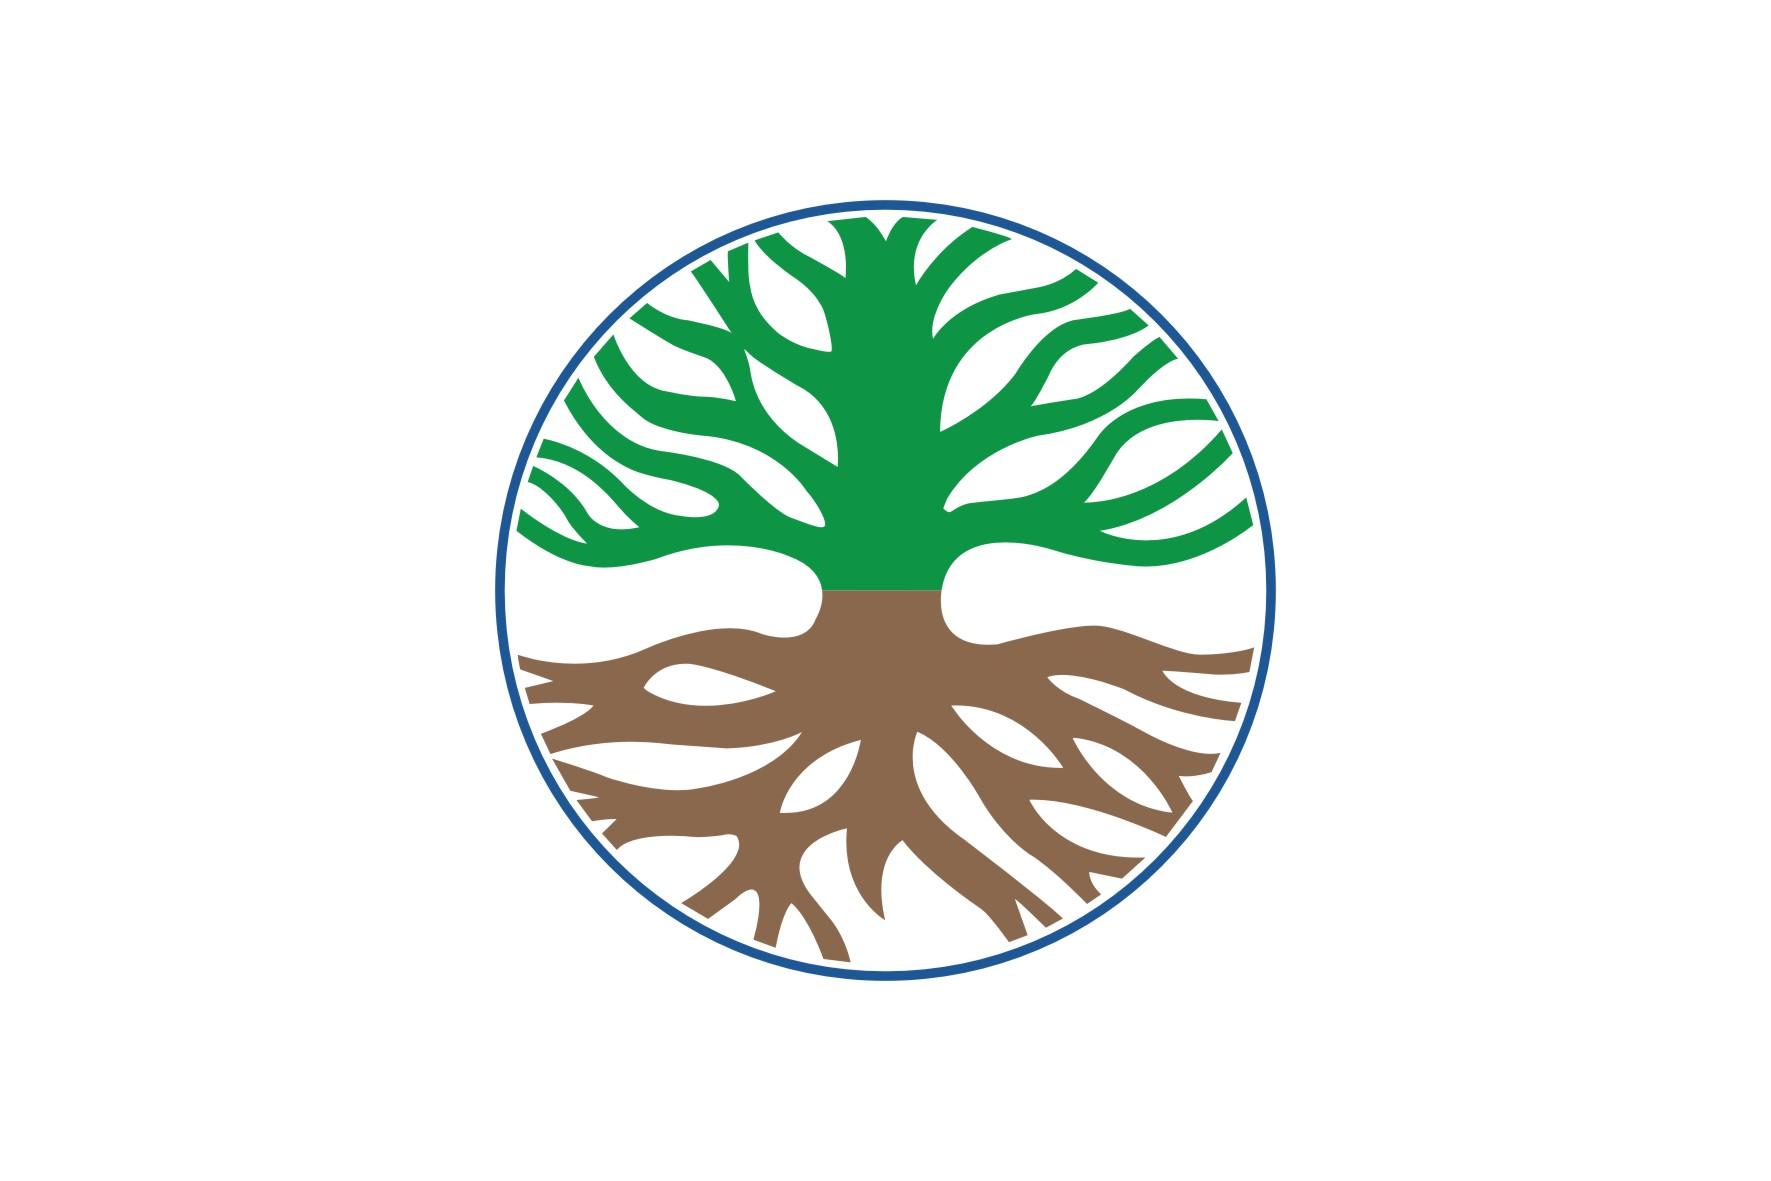 Logo+Kementerian+Lingkungan+Hidup.JPG (1771×1181)